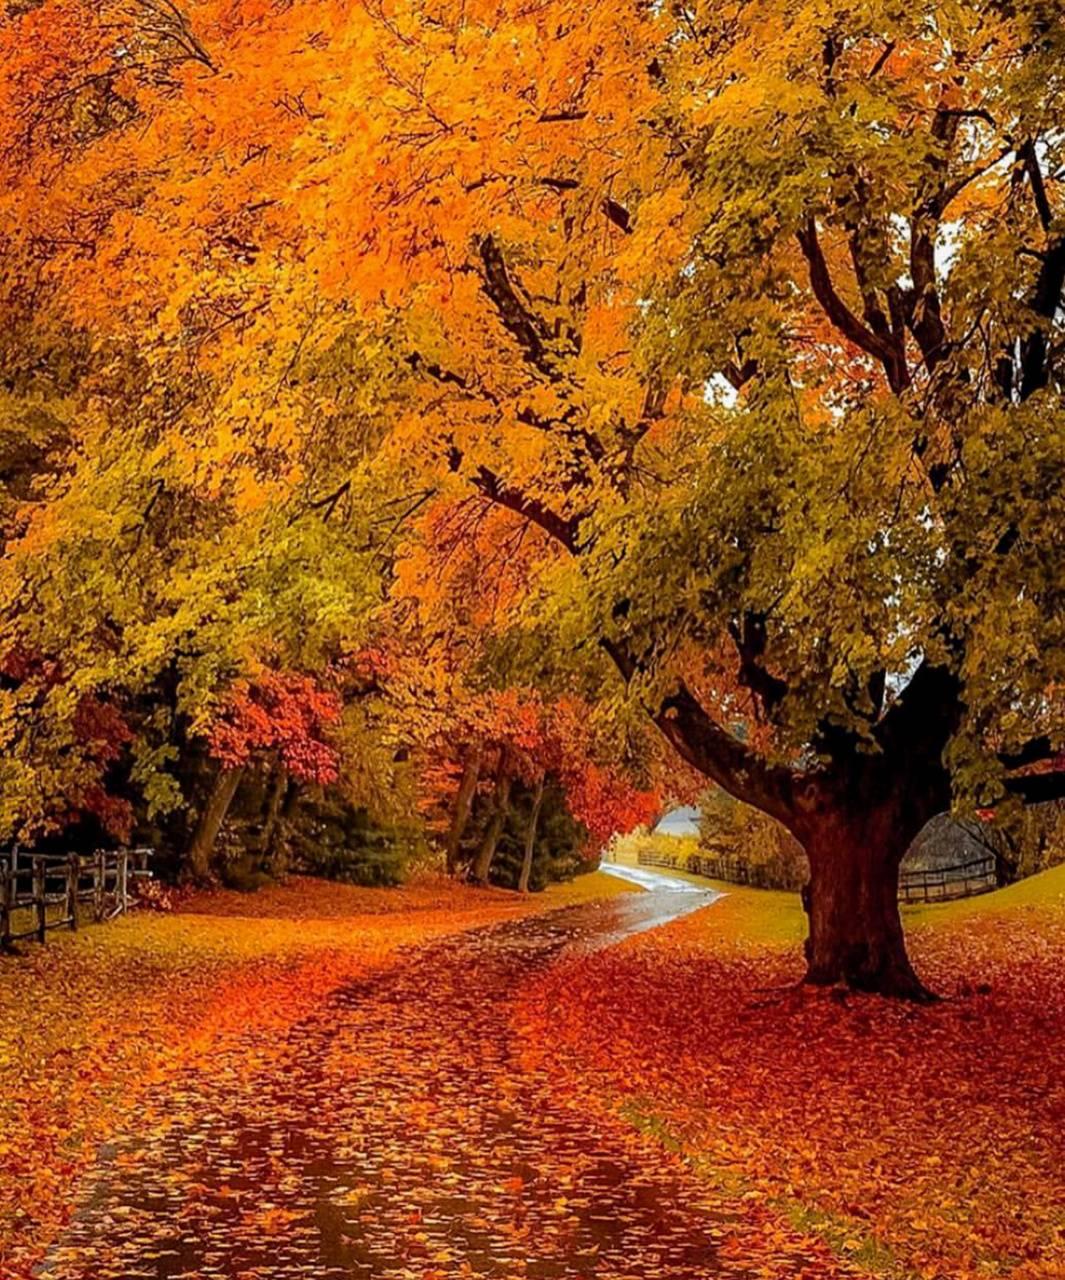 Autumn landscaping